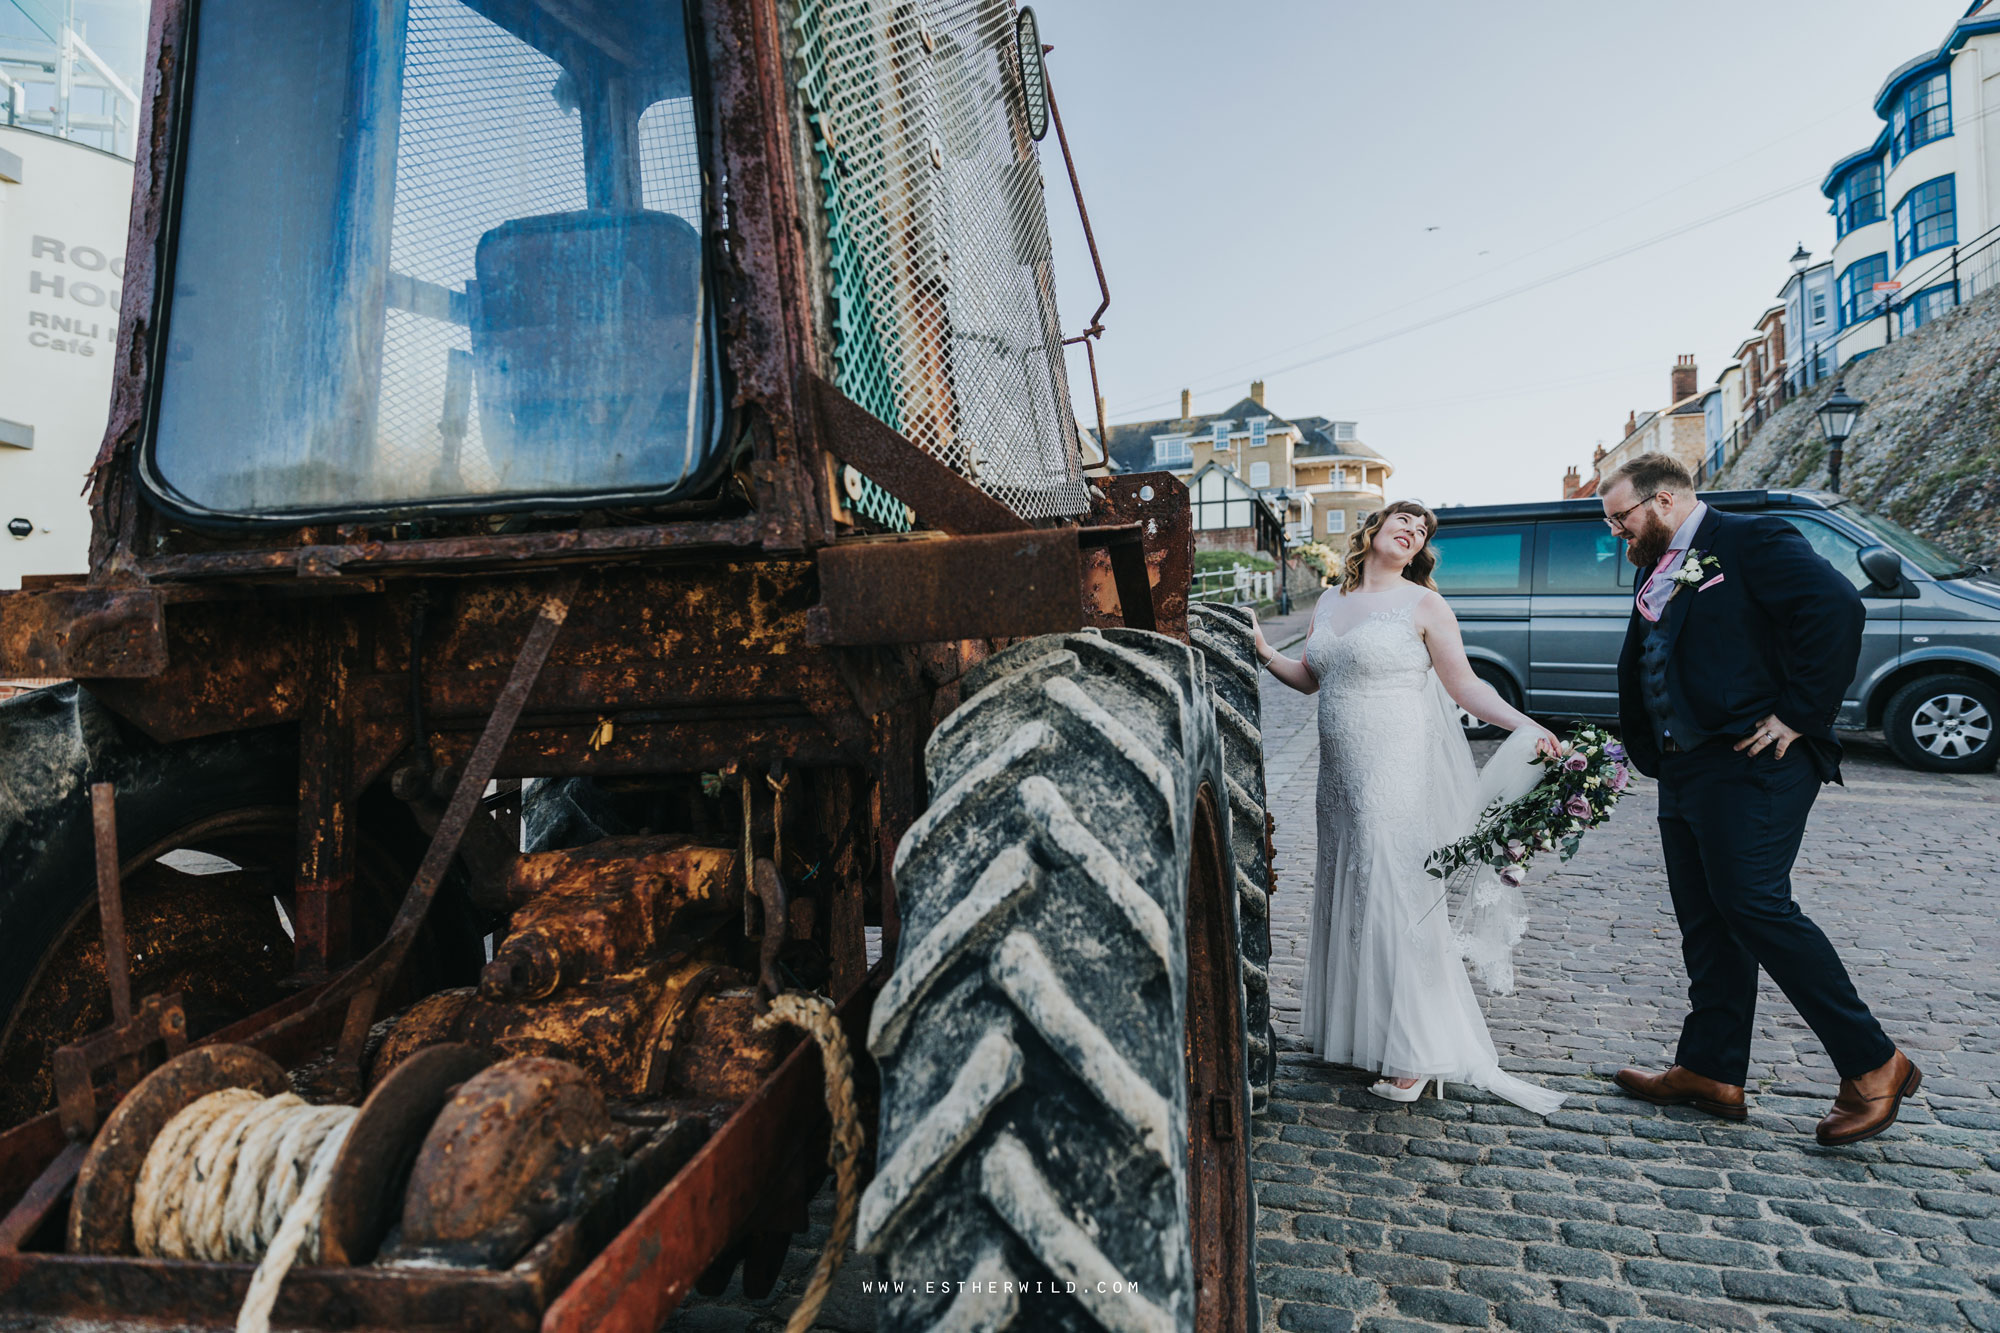 Cromer_Wedding_Beach_Outdoor_Ceremony_Norfolk_North_Lodge_Registry_Office_Rocket_House_Cafe_Cromer_Pier_IMG_4751.jpg